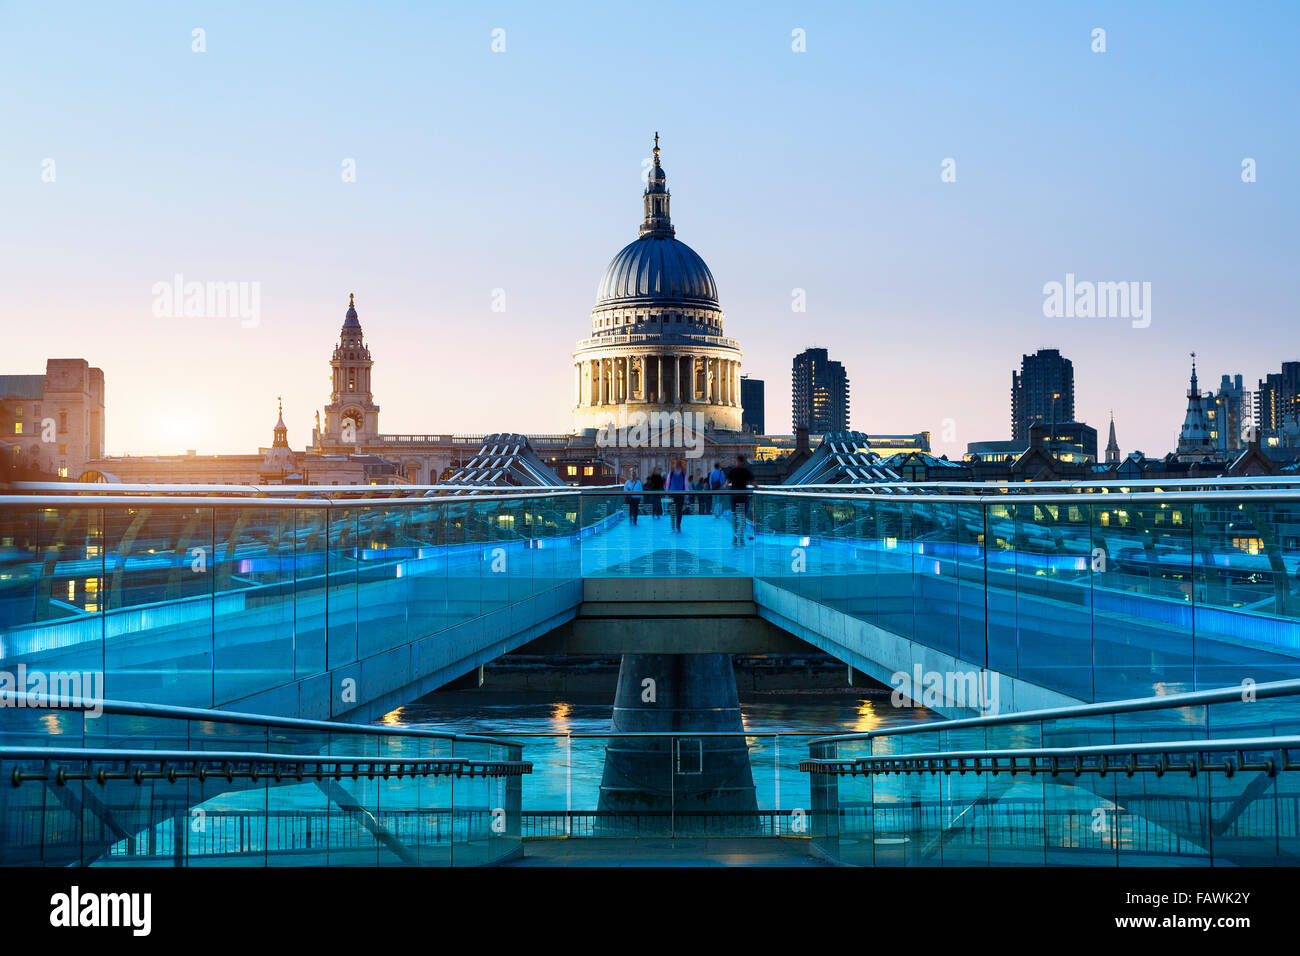 London, Millennium Bridge beleuchtet Stockbild